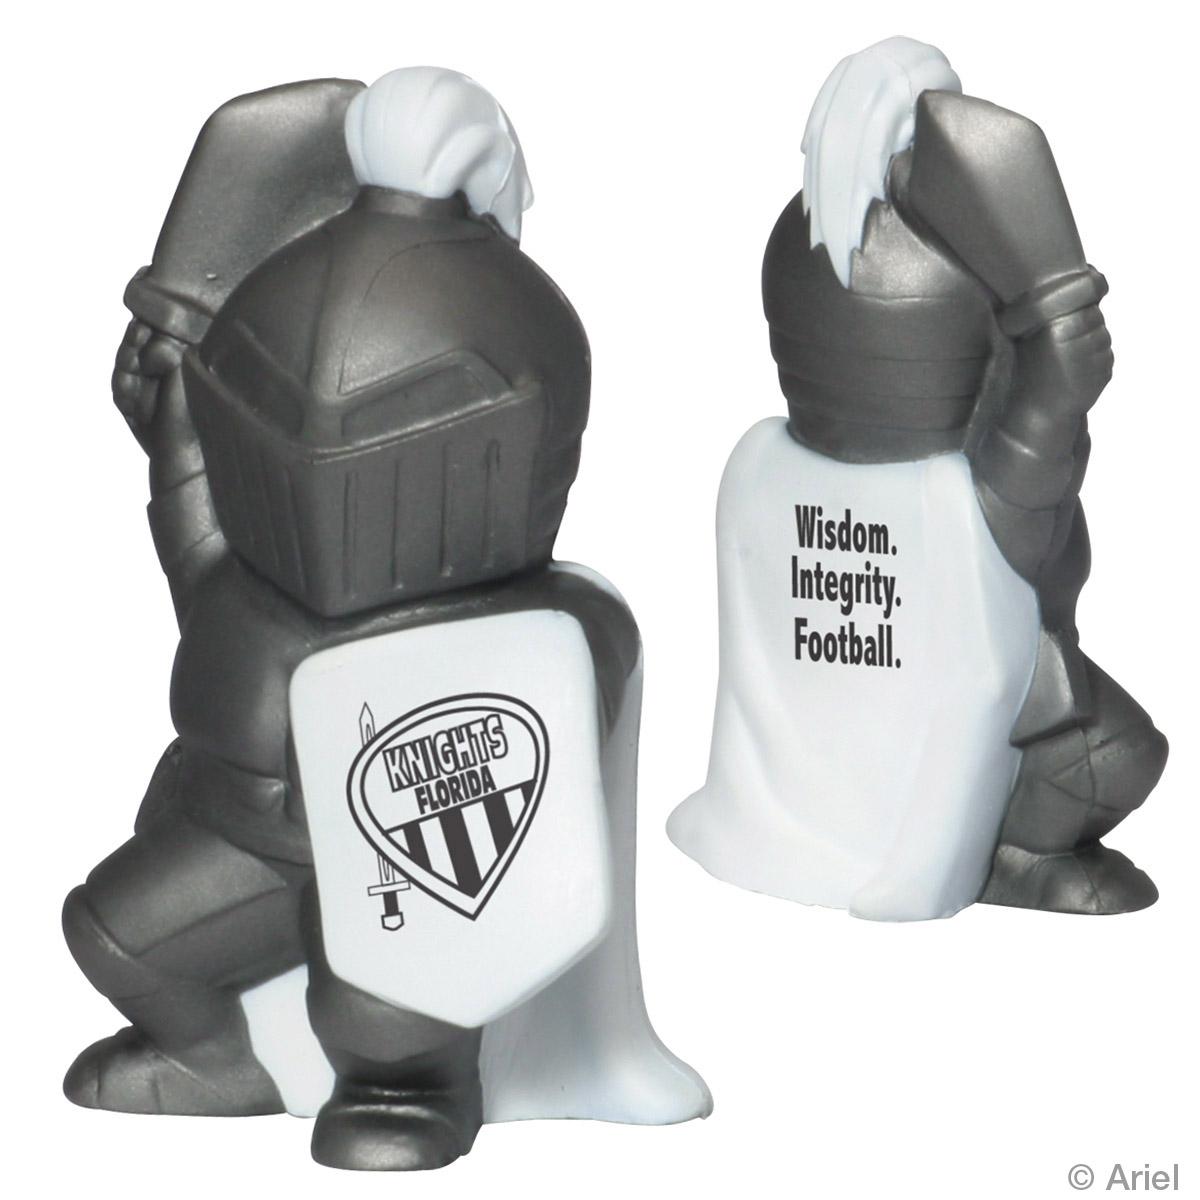 Knight Mascot Stress Reliever, LMT-KN06 - 1 Colour Imprint